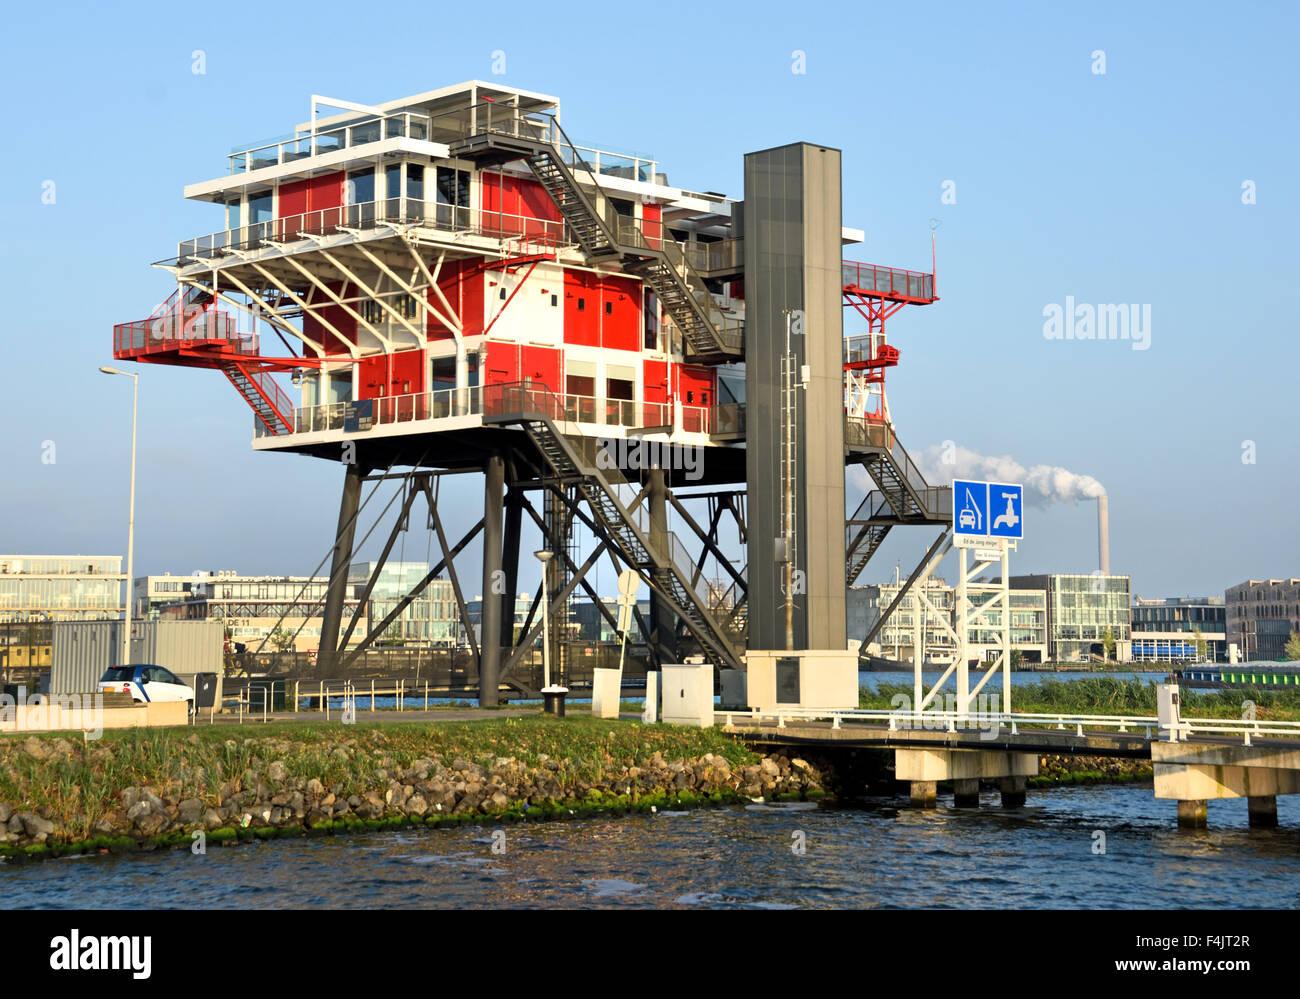 REM Eiland - 2011 Restaurant on the IJ Port Amsterdam Netherlands ( REM Island built in the Republic of Ireland - Stock Image